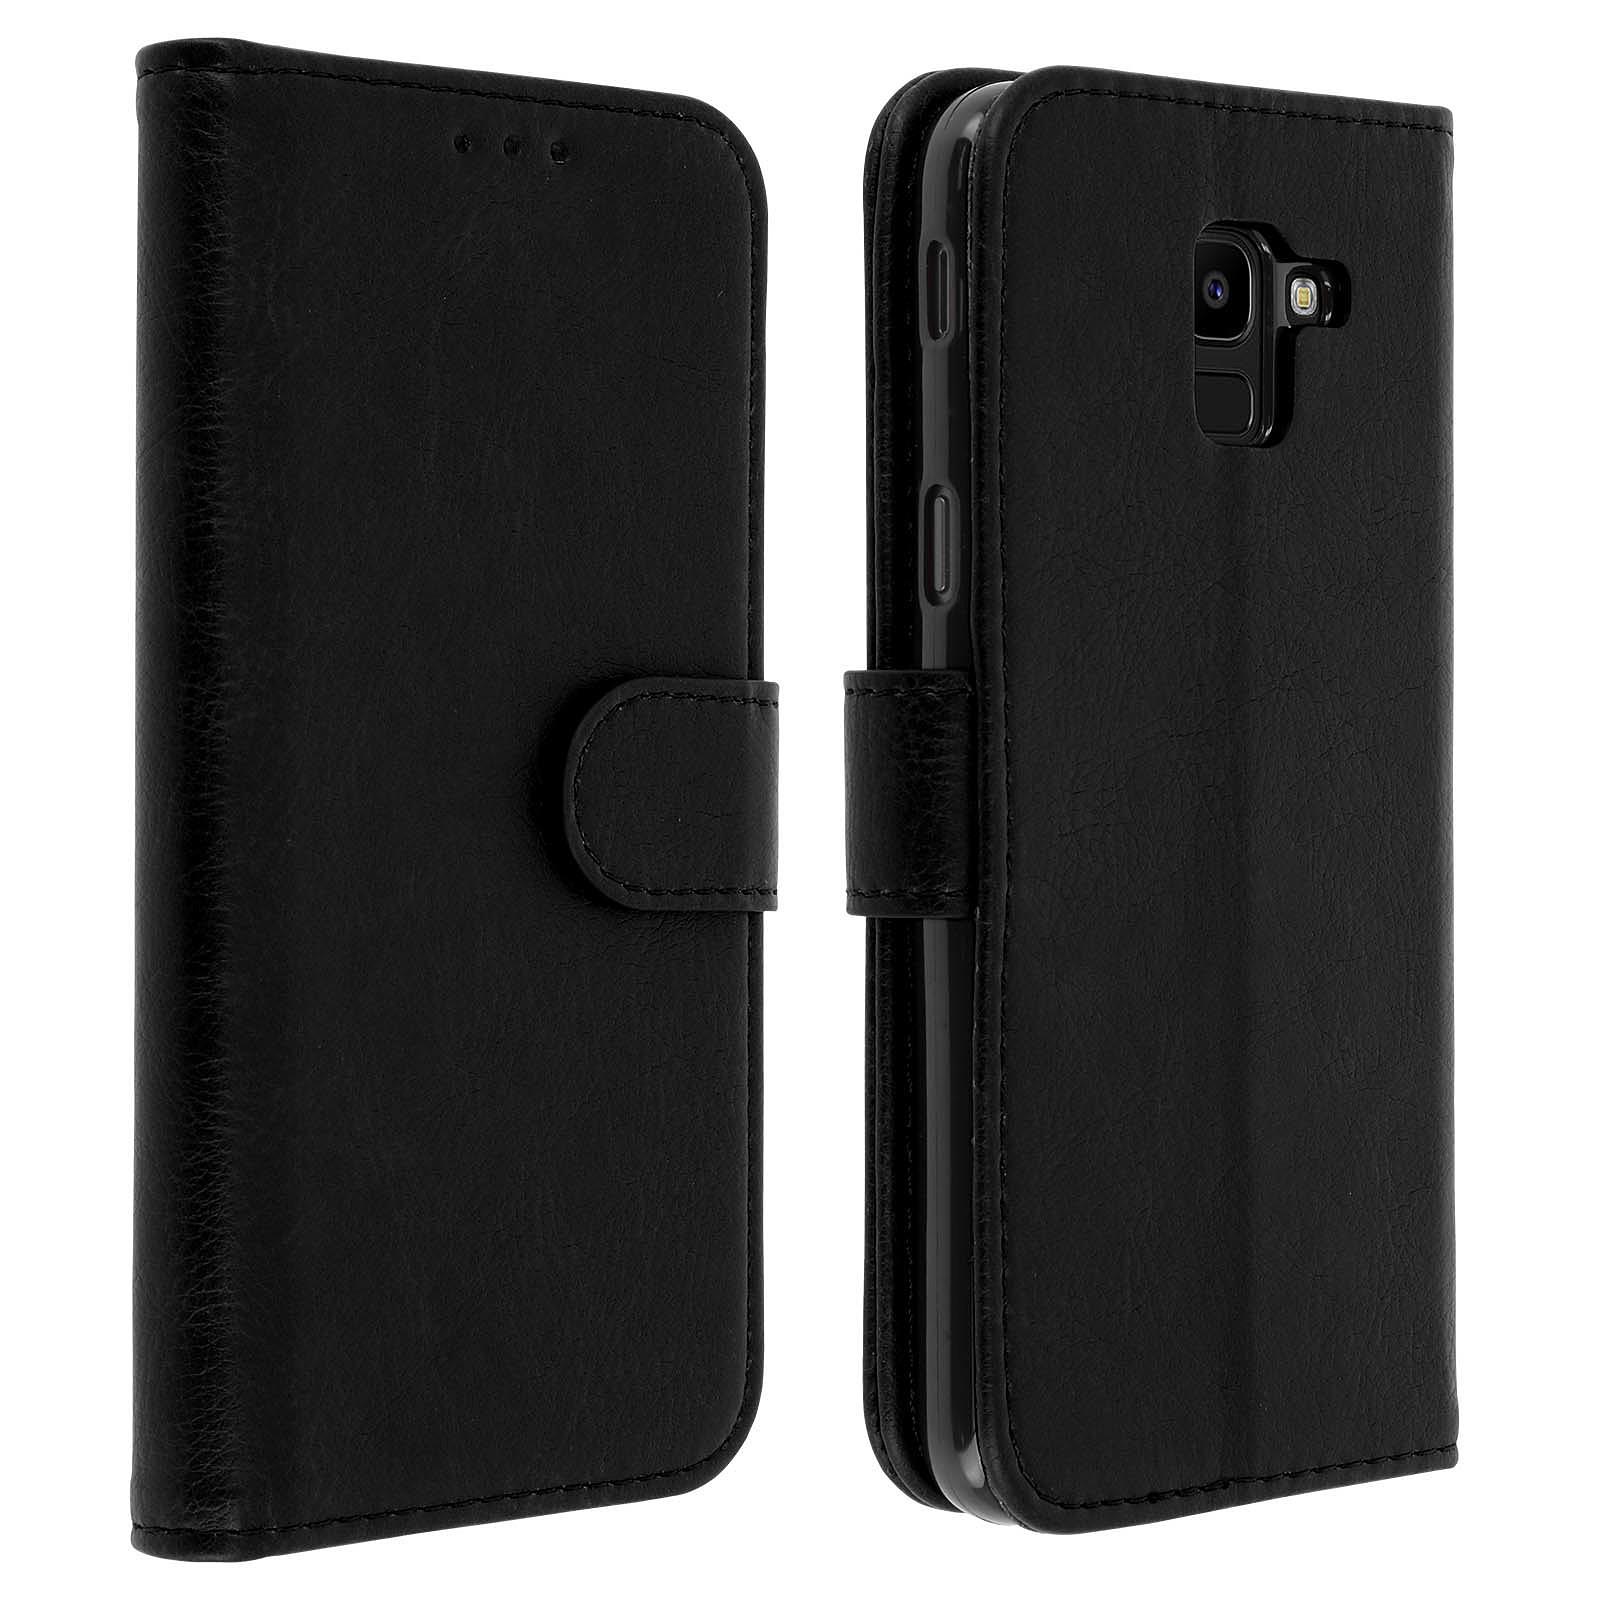 Avizar Etui folio Noir Portefeuille pour Samsung Galaxy J6